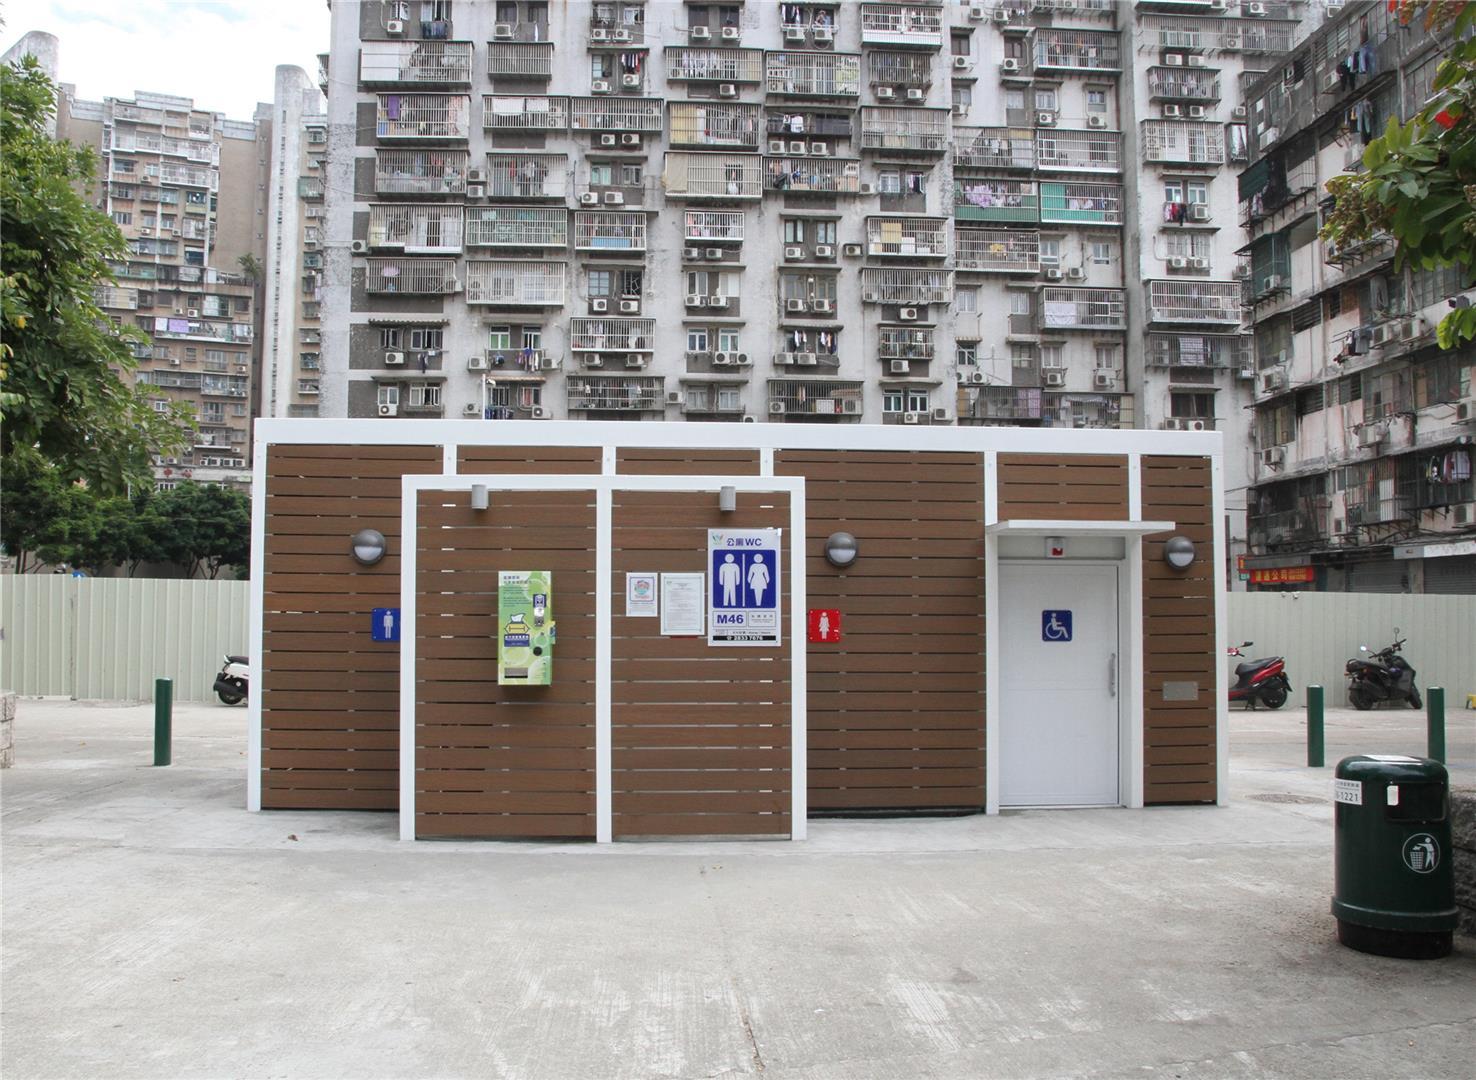 M46 Public toilet at the Leisure Area in Rua dois do Bairro do Iao Hon